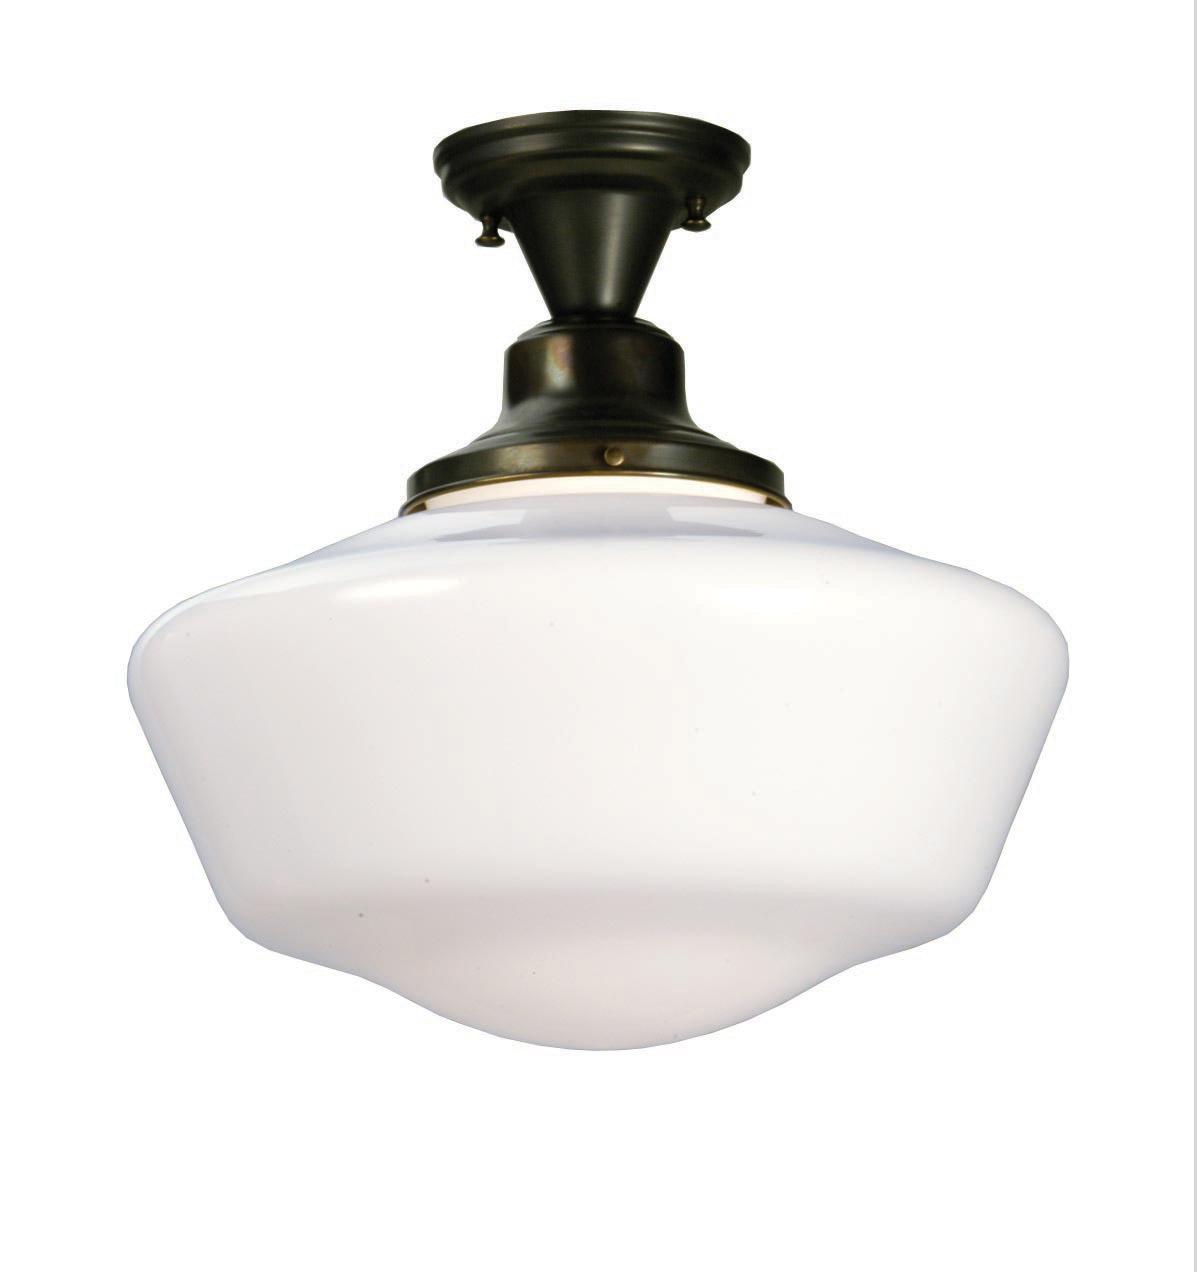 Meyda 30268 Schoolhouse W Globe Semi Flush Ceiling Fixture